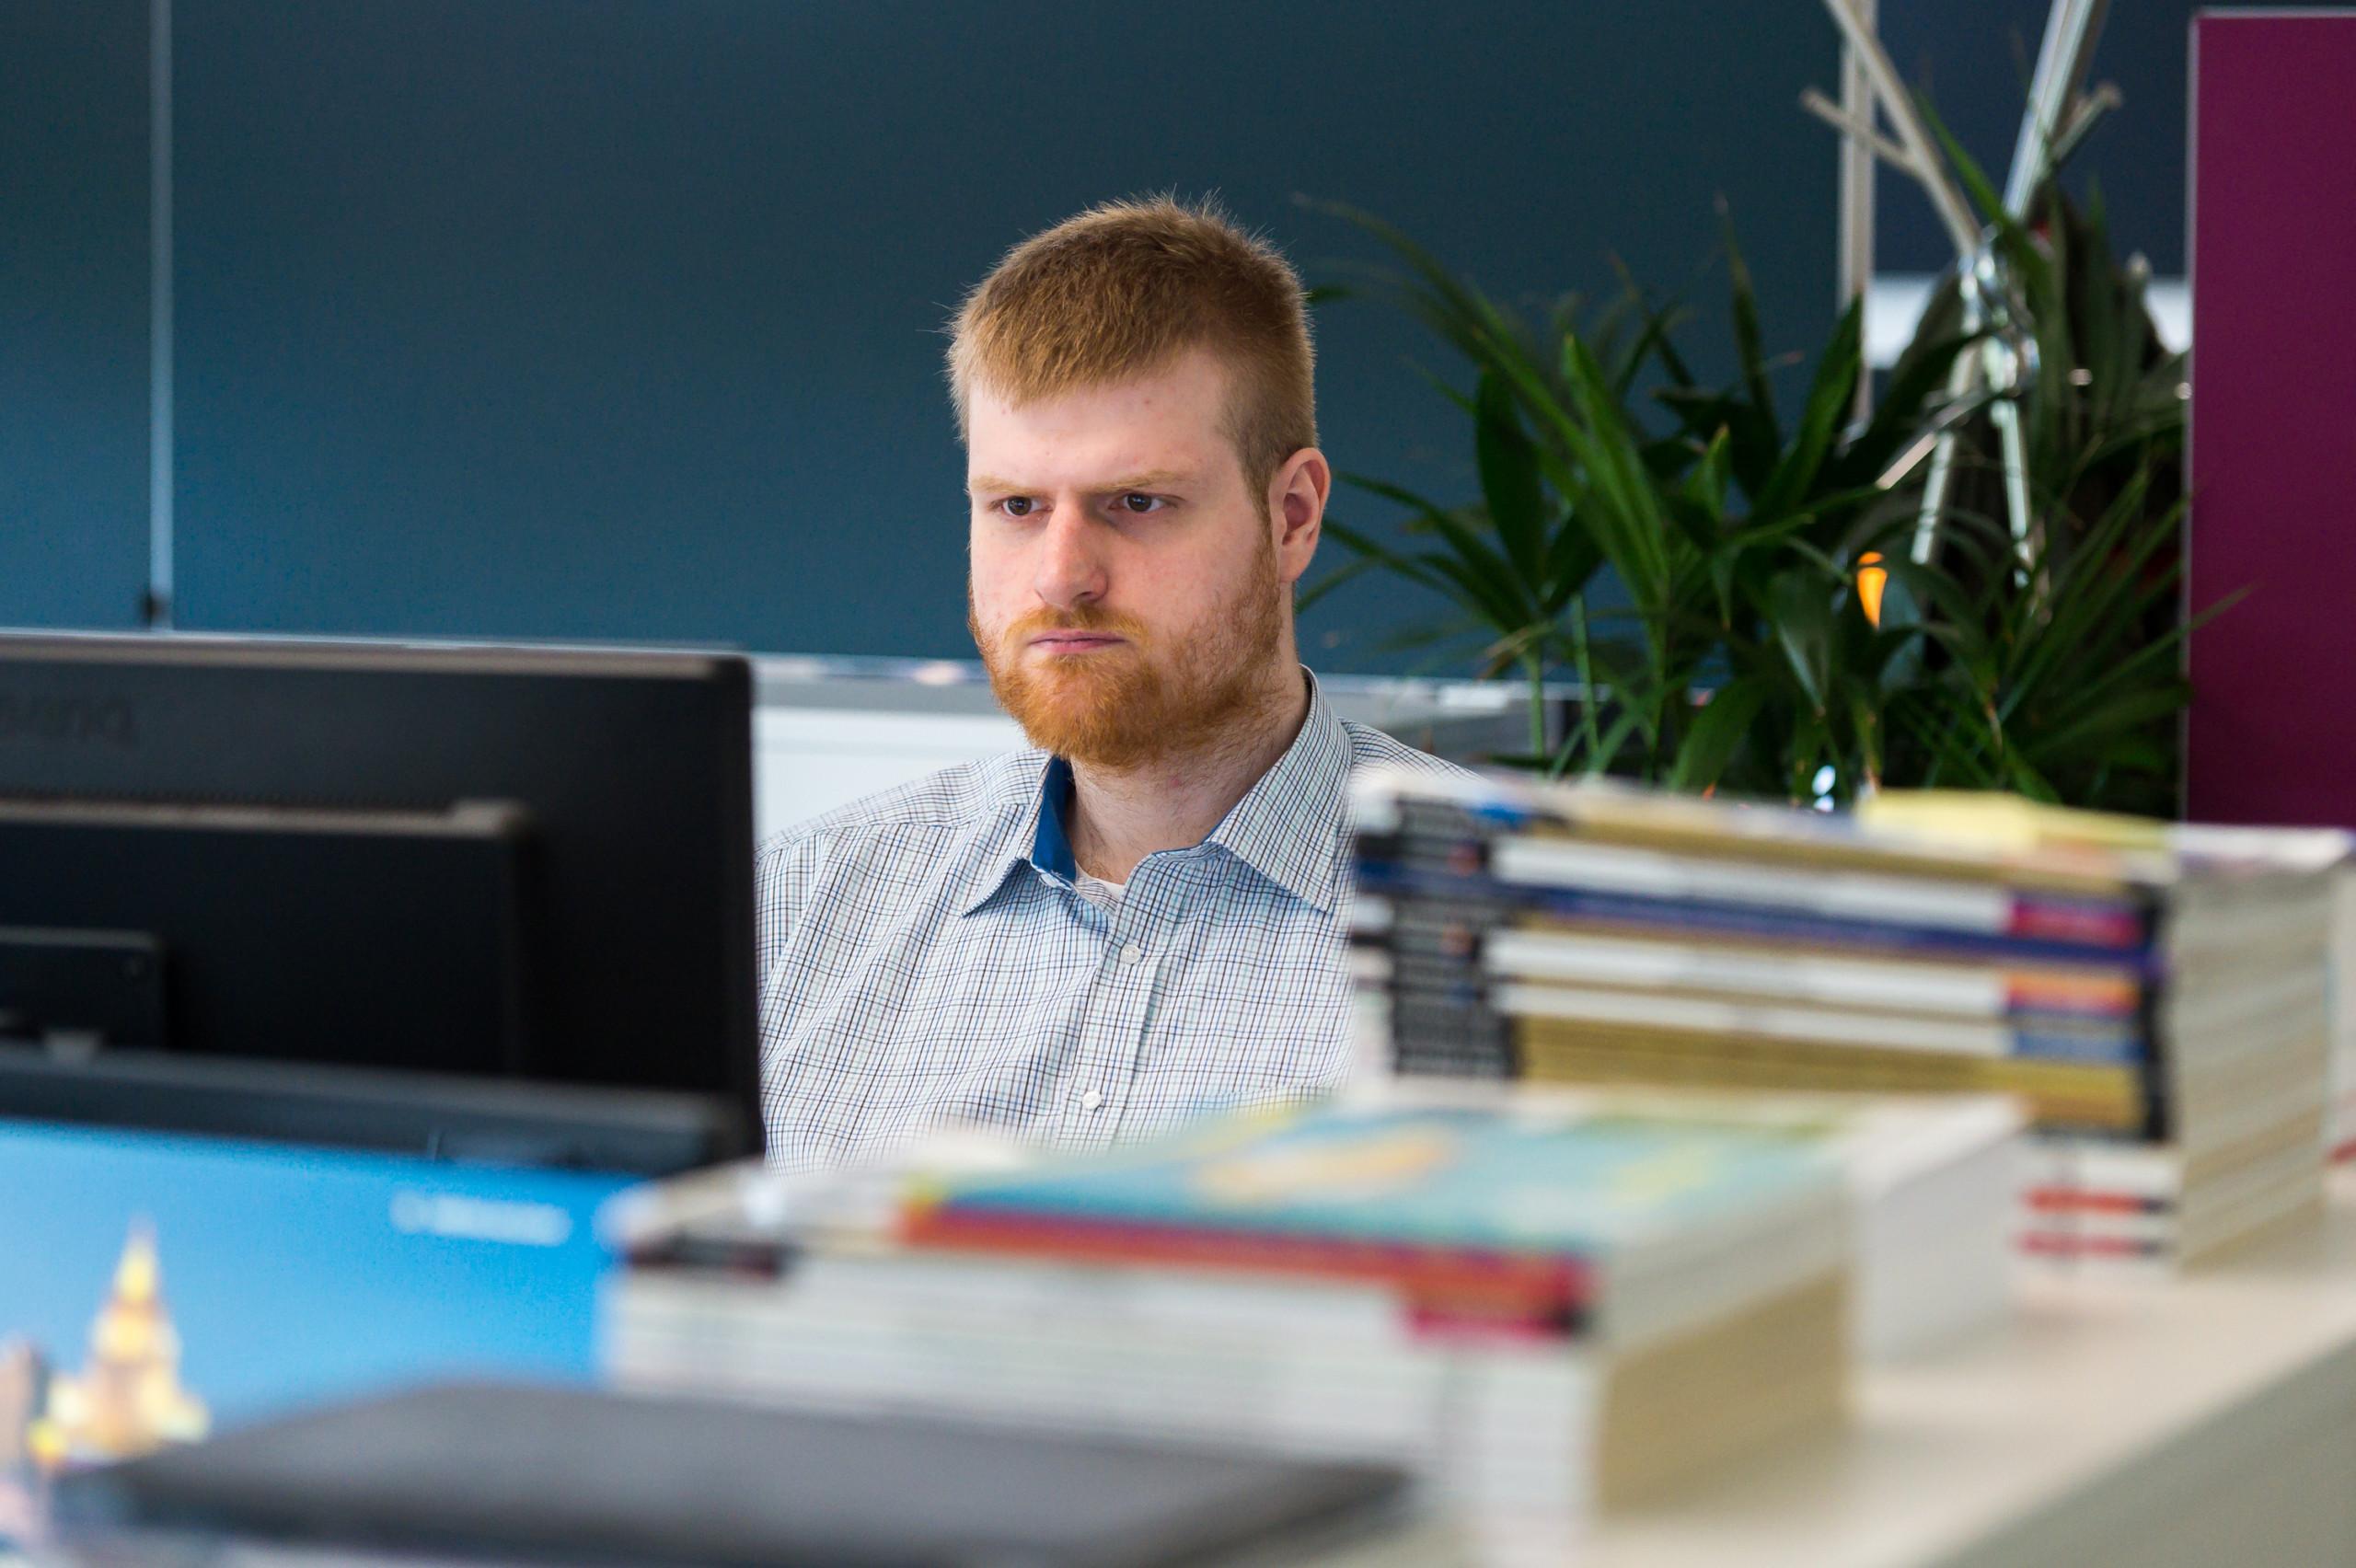 Software Engineer Job